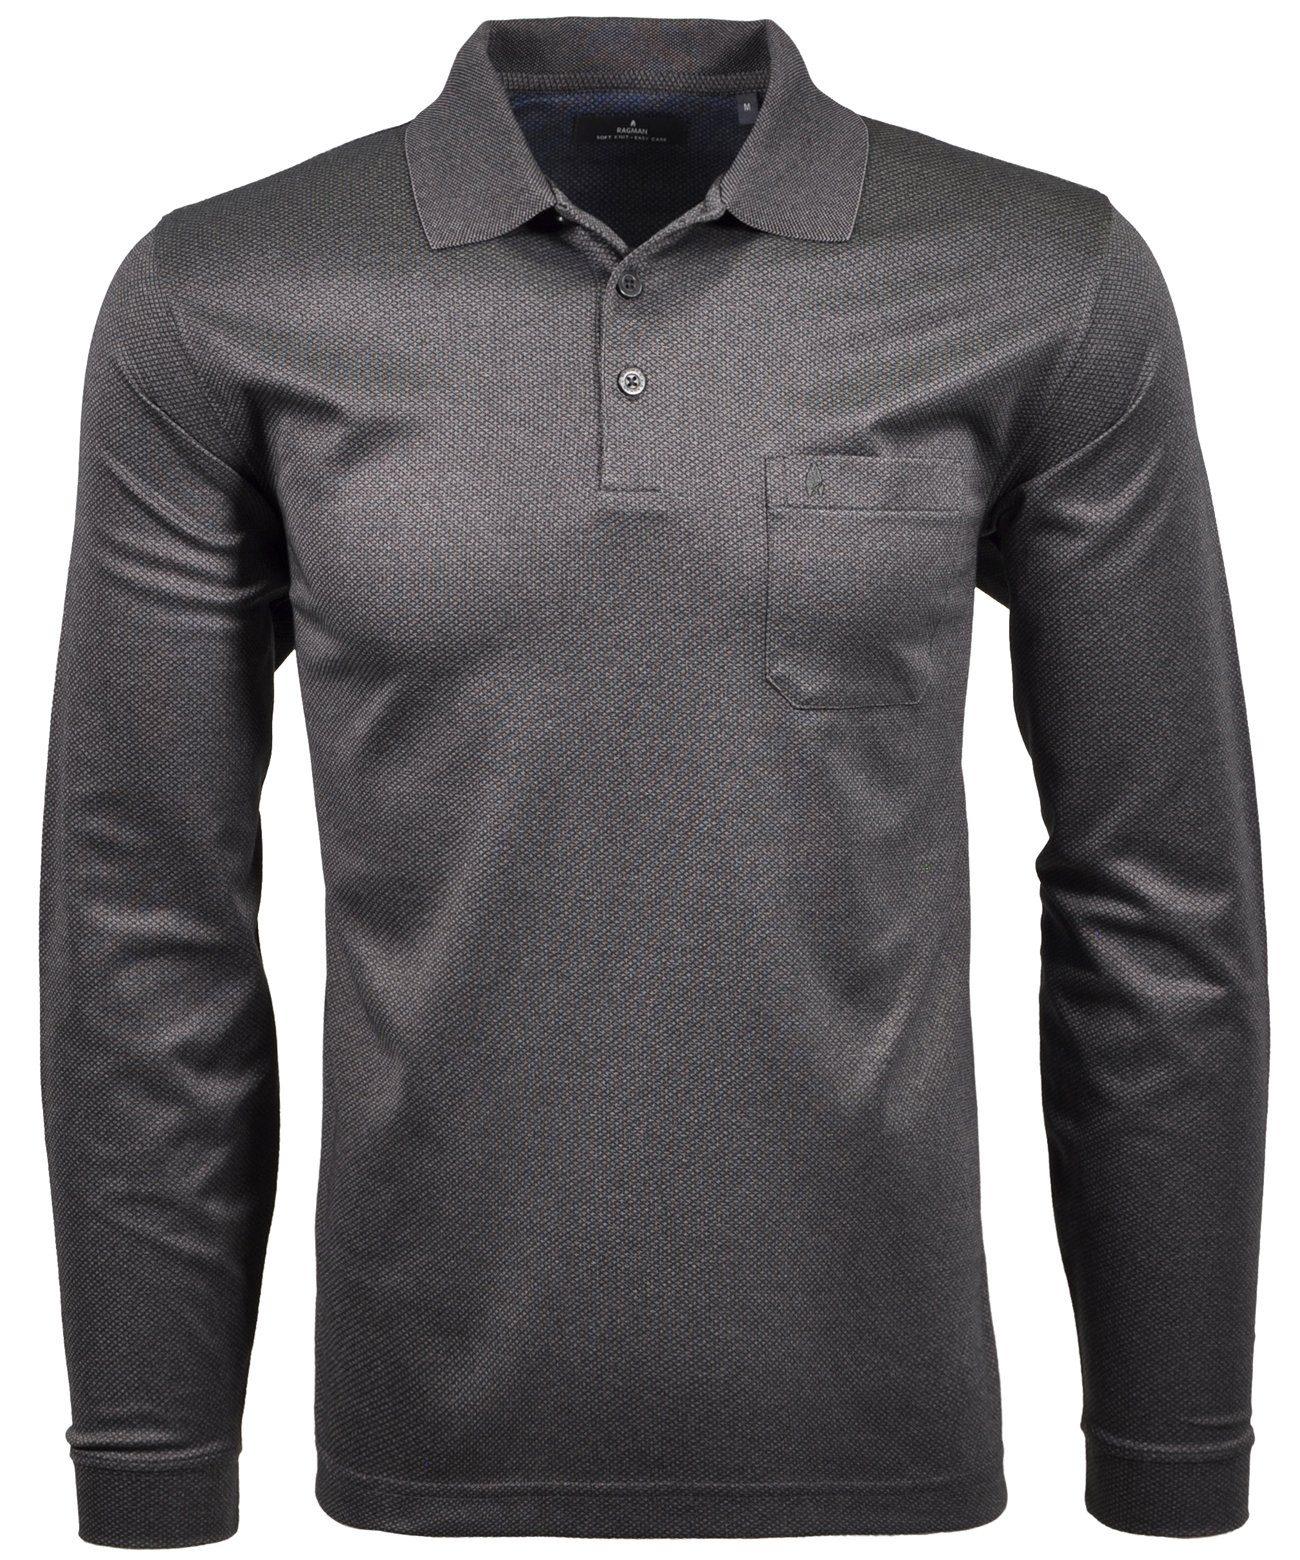 Kaufen Online Ragman Poloshirt Ragman Poloshirt Kaufen Online Poloshirt Ragman Kaufen Online Nmwv80n